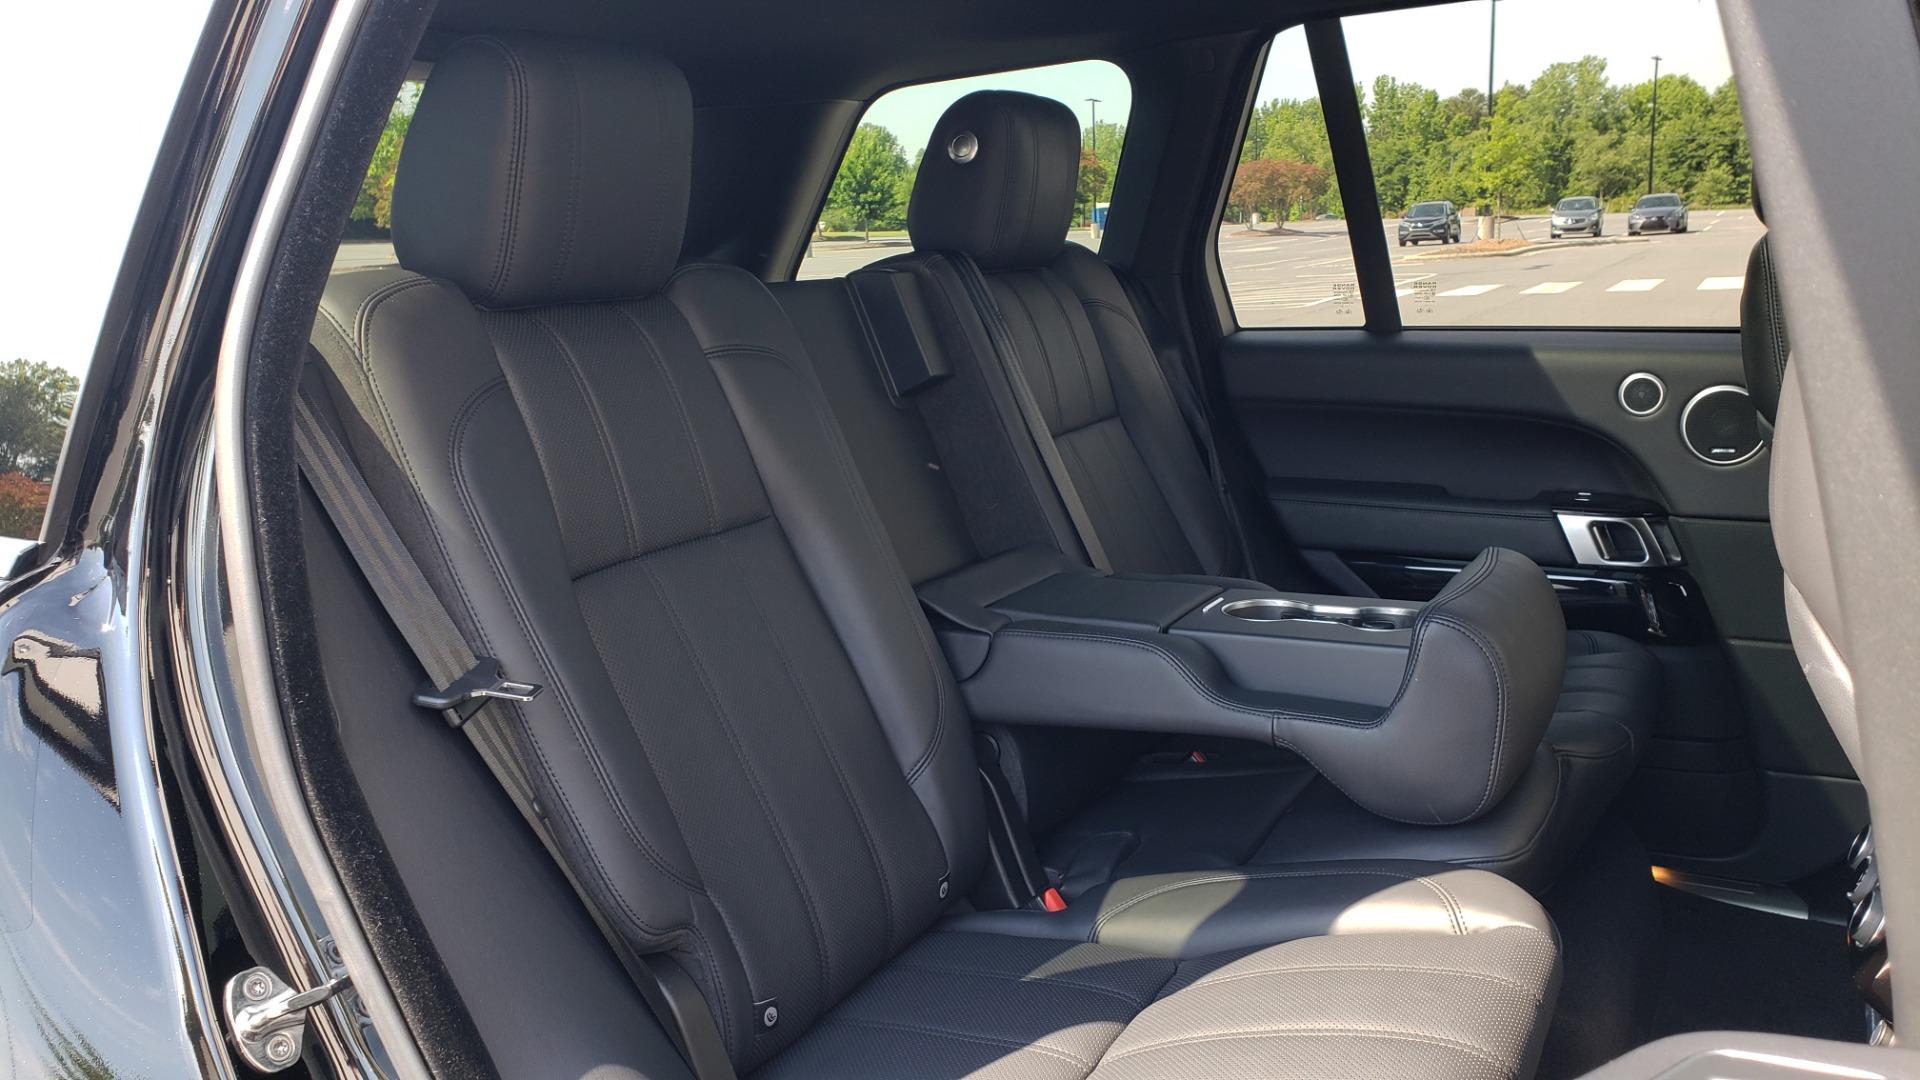 Used 2017 Land Rover RANGE ROVER SC V8 / VISION ASST / DRIVE PKG / MERIDIAN SOUND / PANO-ROOF / NAV / BSM for sale $75,995 at Formula Imports in Charlotte NC 28227 79